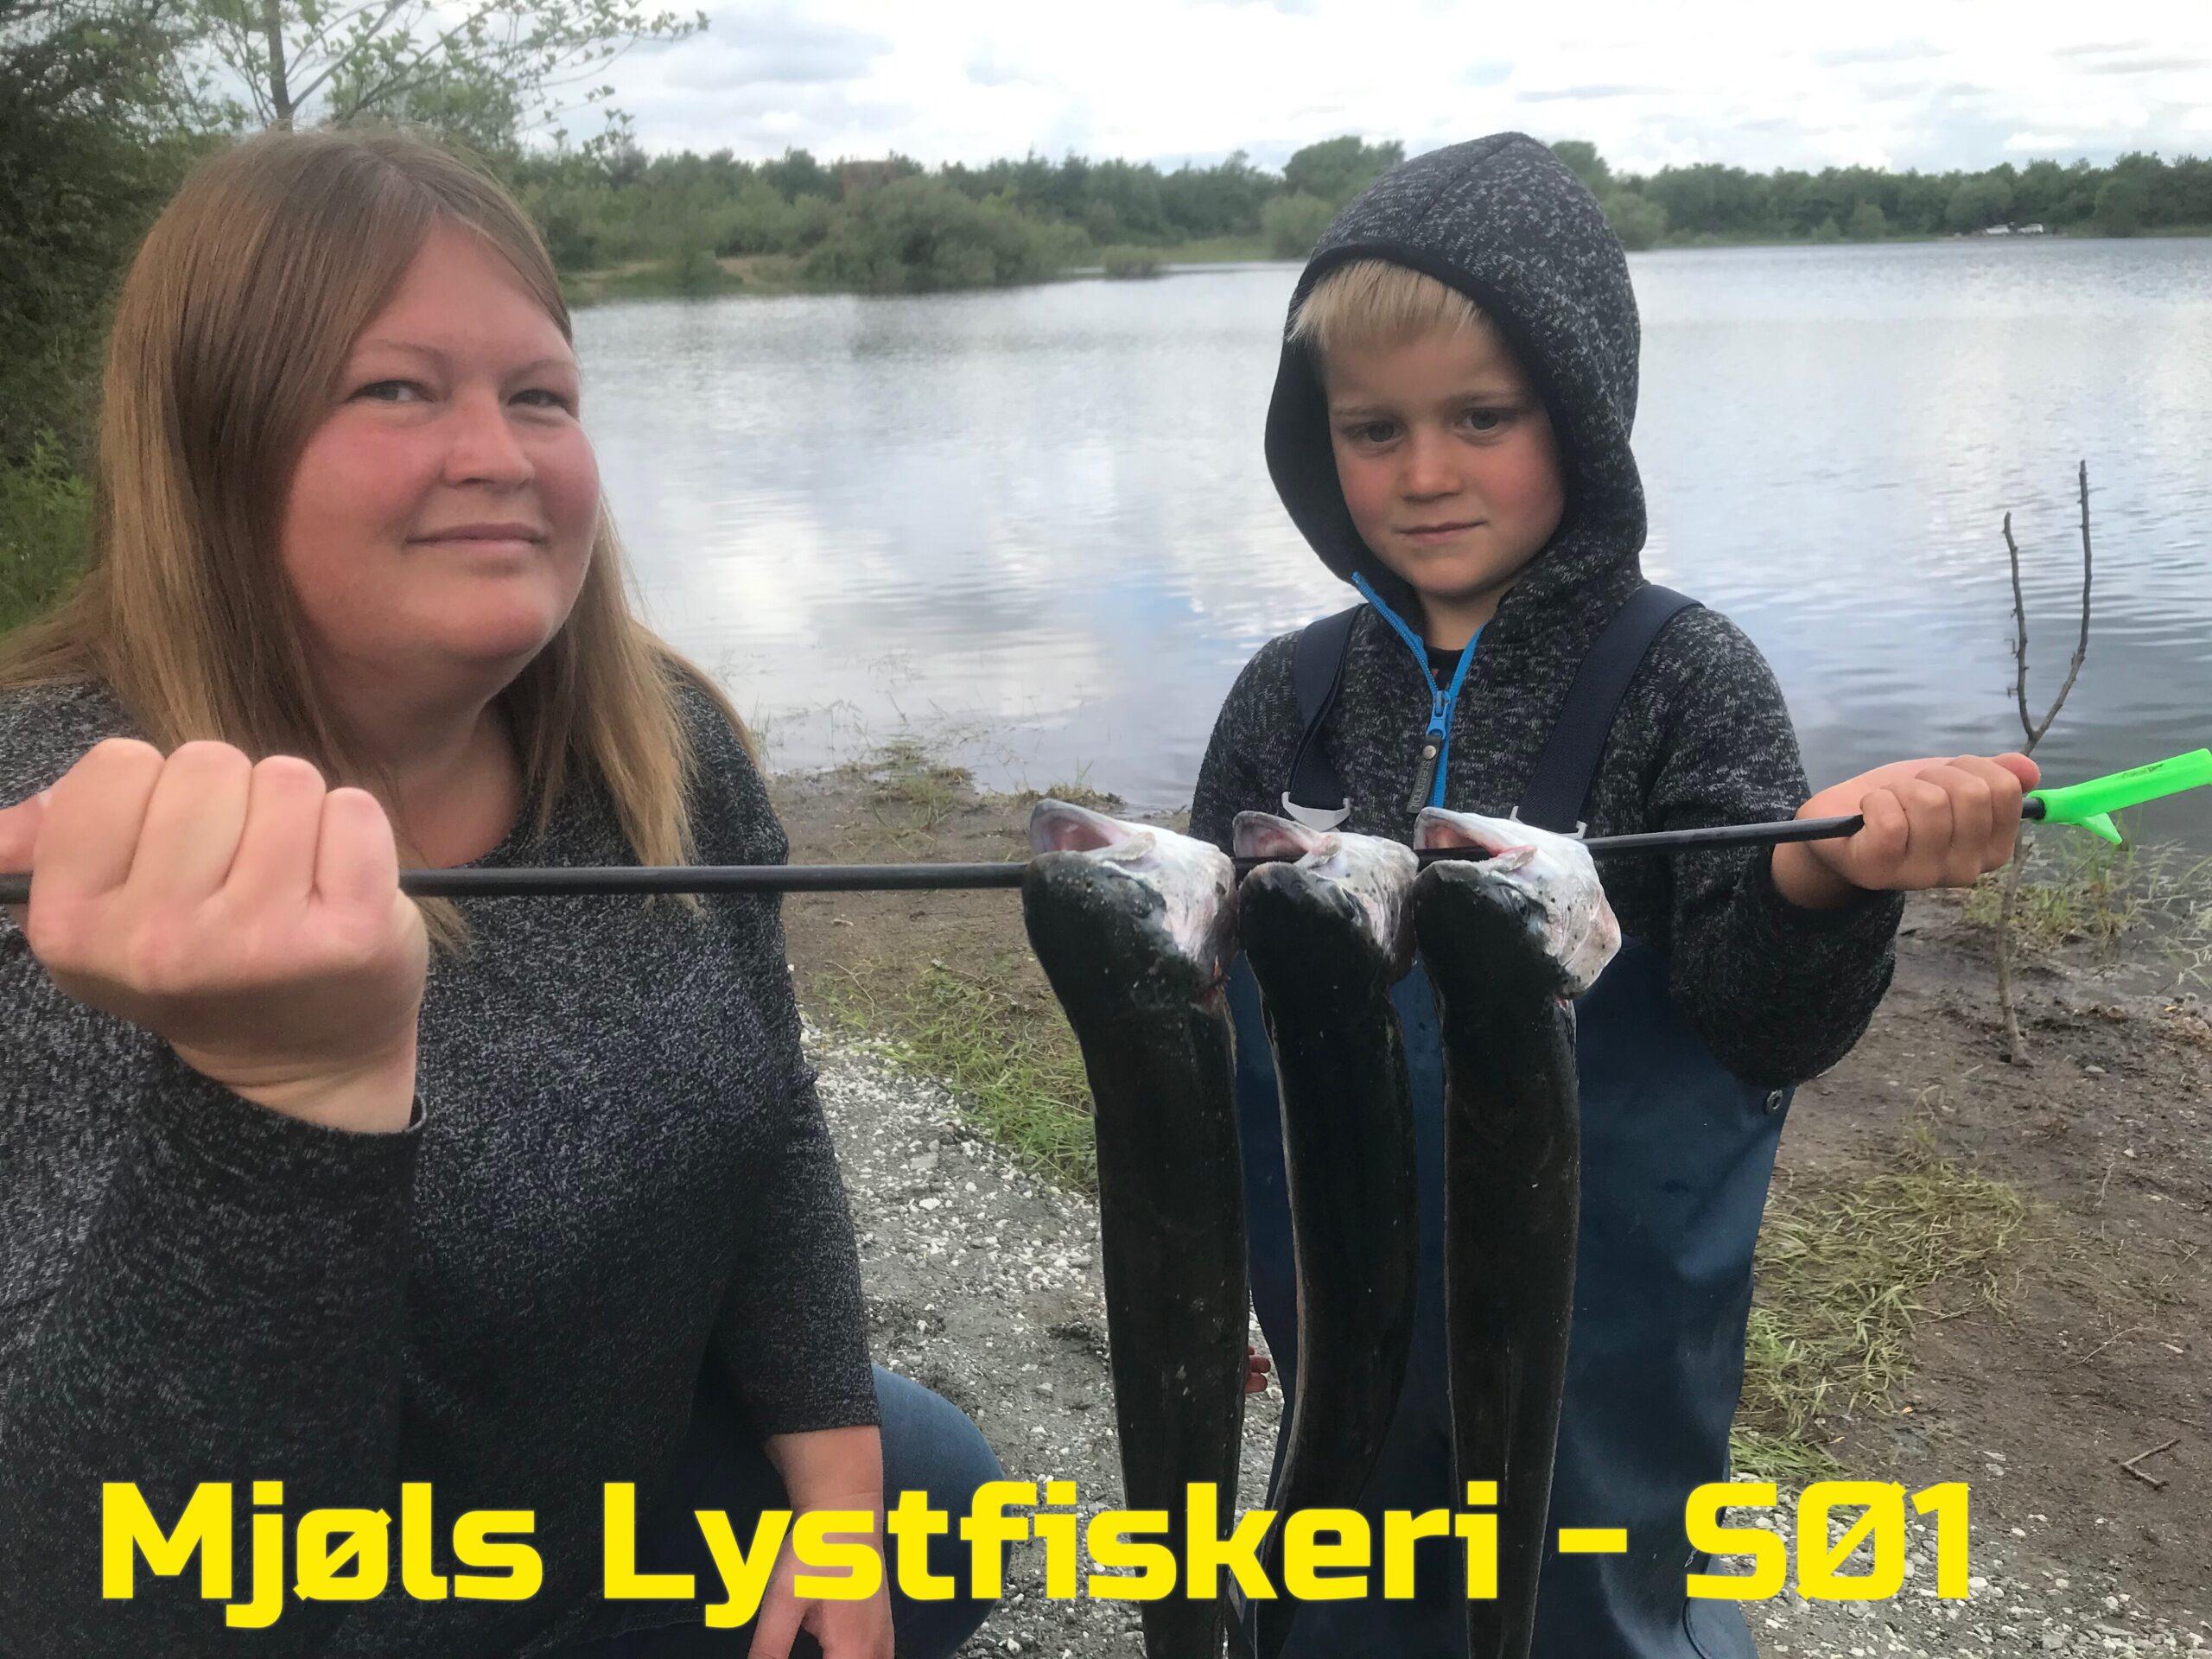 Mjøls Lystfiskeri – Mor var også med på fisketur